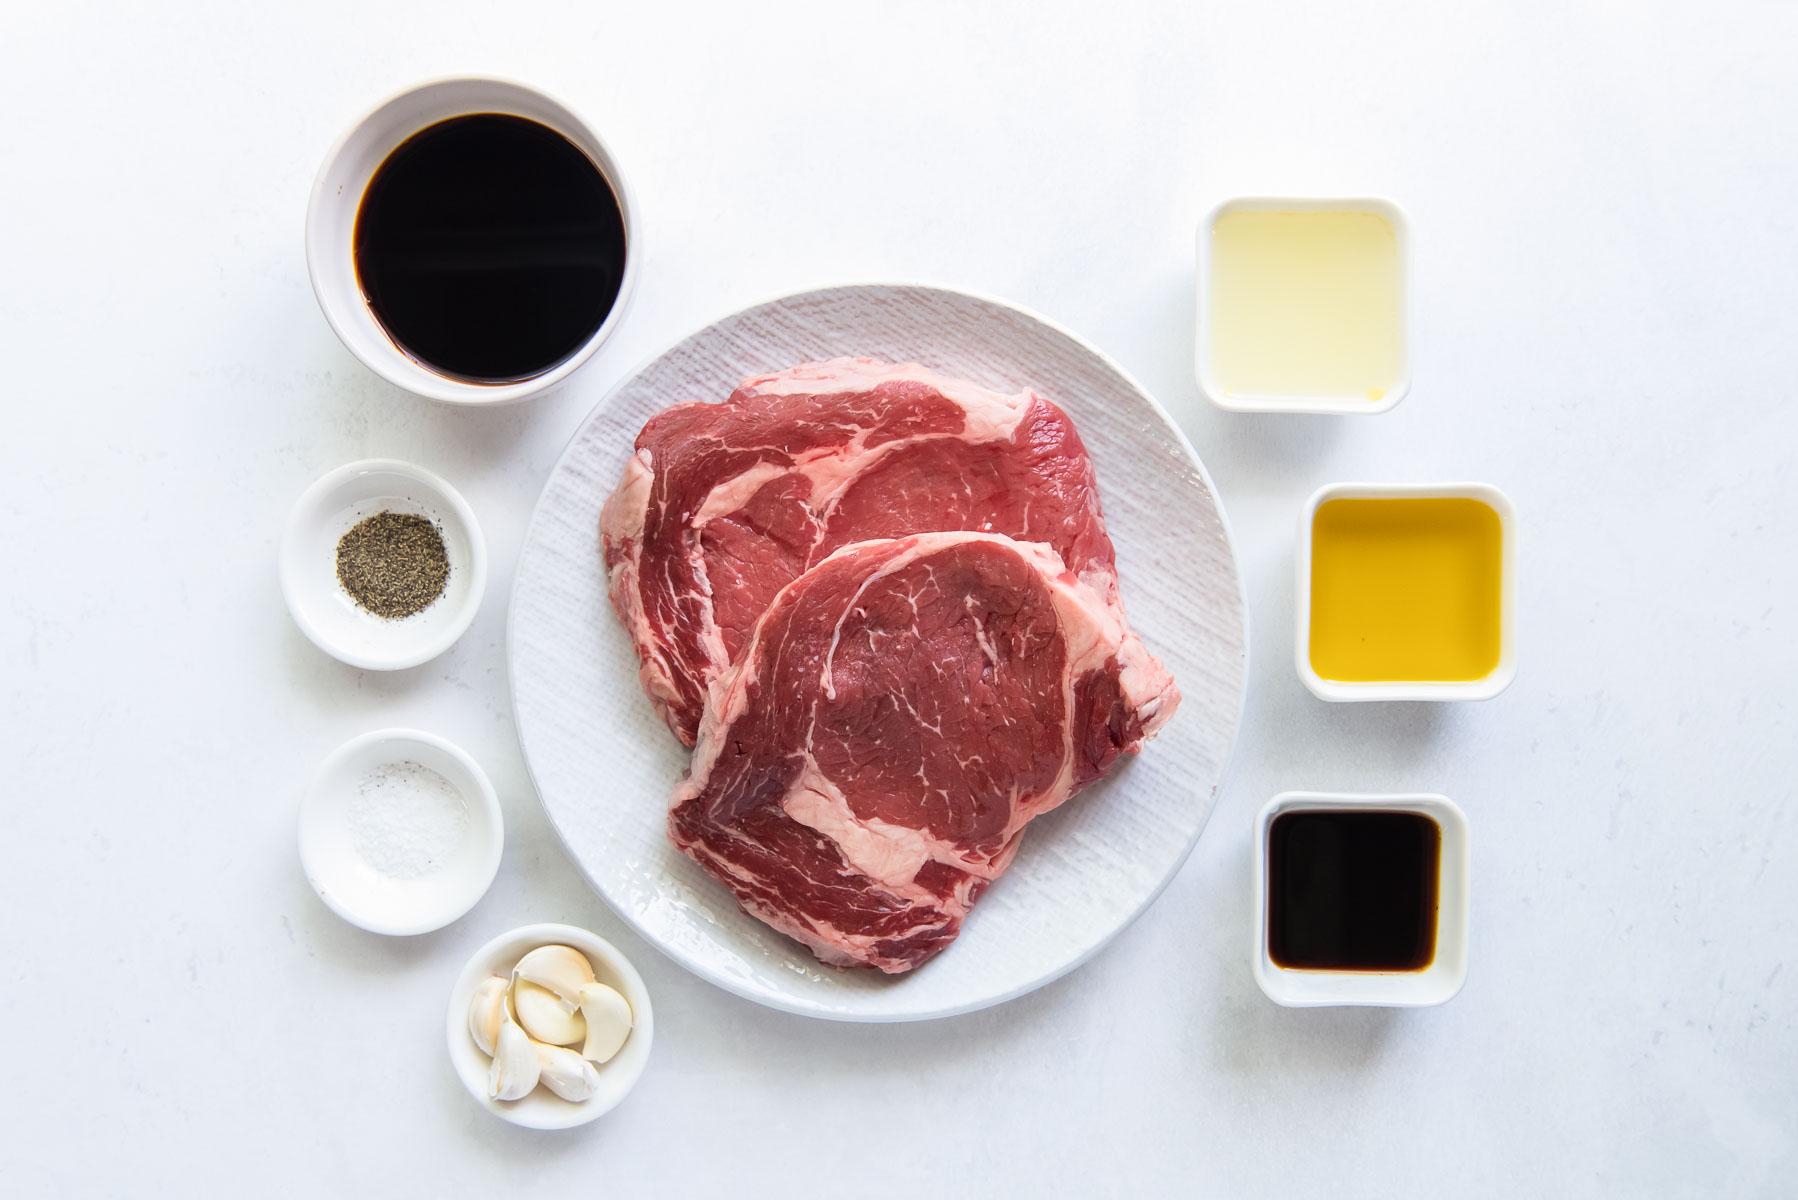 ingredients for steak marinade recipe